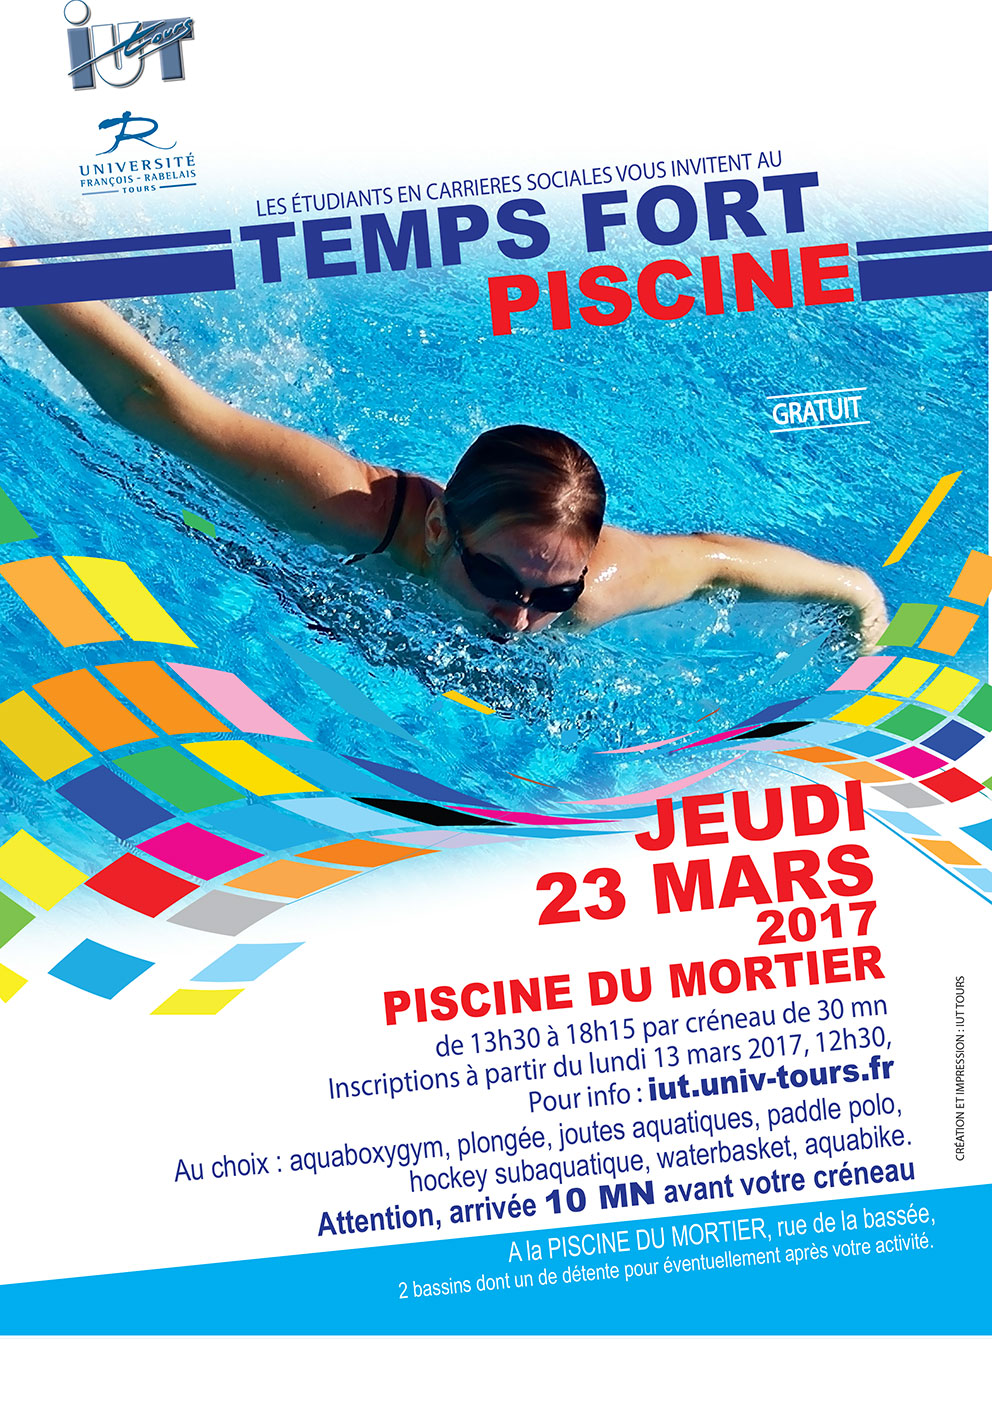 I u t de tours sport tf5 for Piscine mortier tours